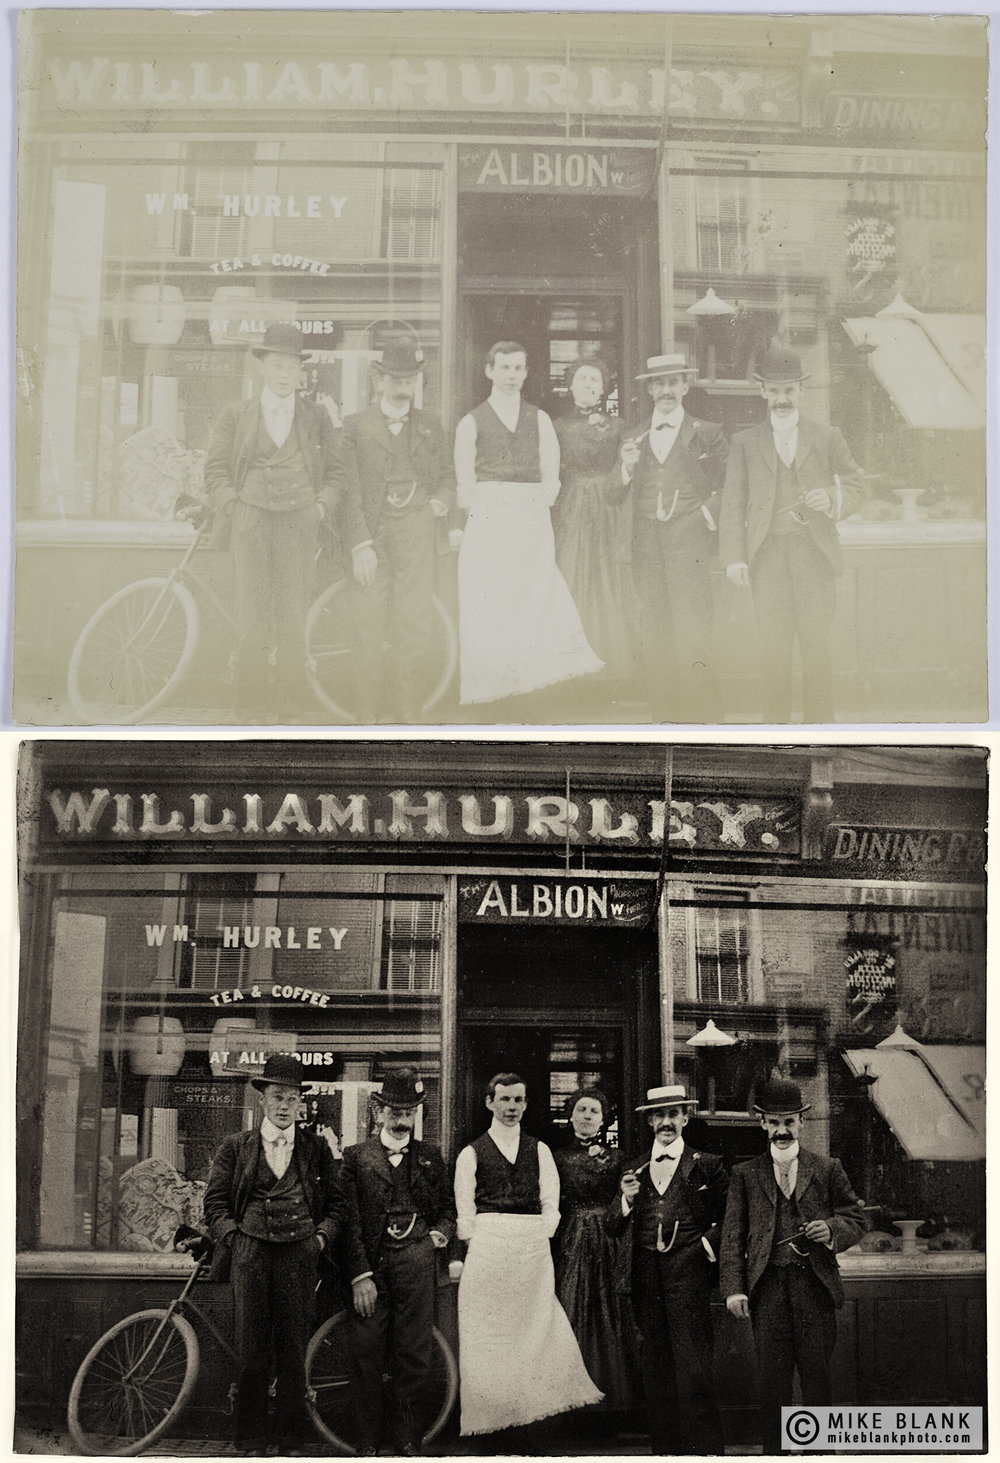 Digital restoration: William Hurley / The Albion, Isle of Man